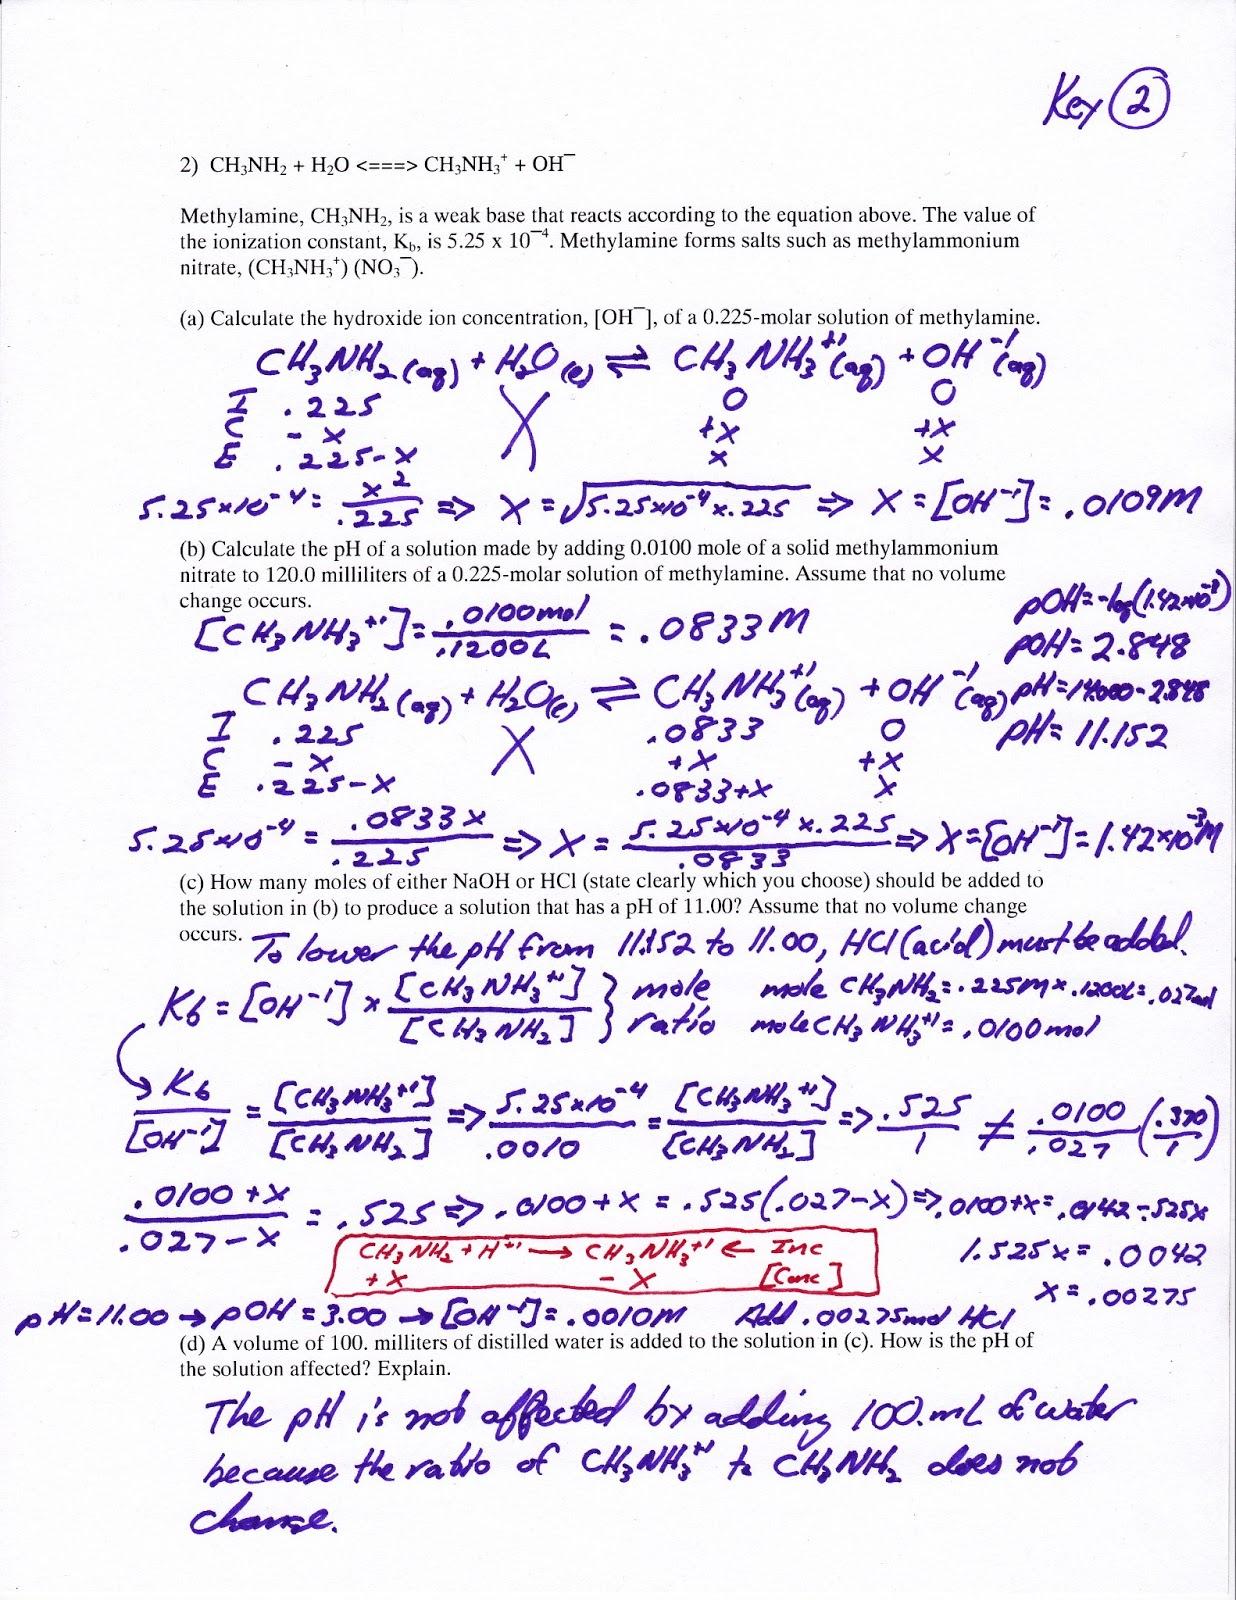 Ap chemistry labs answers - homeworknowgarfield.x.fc2.com